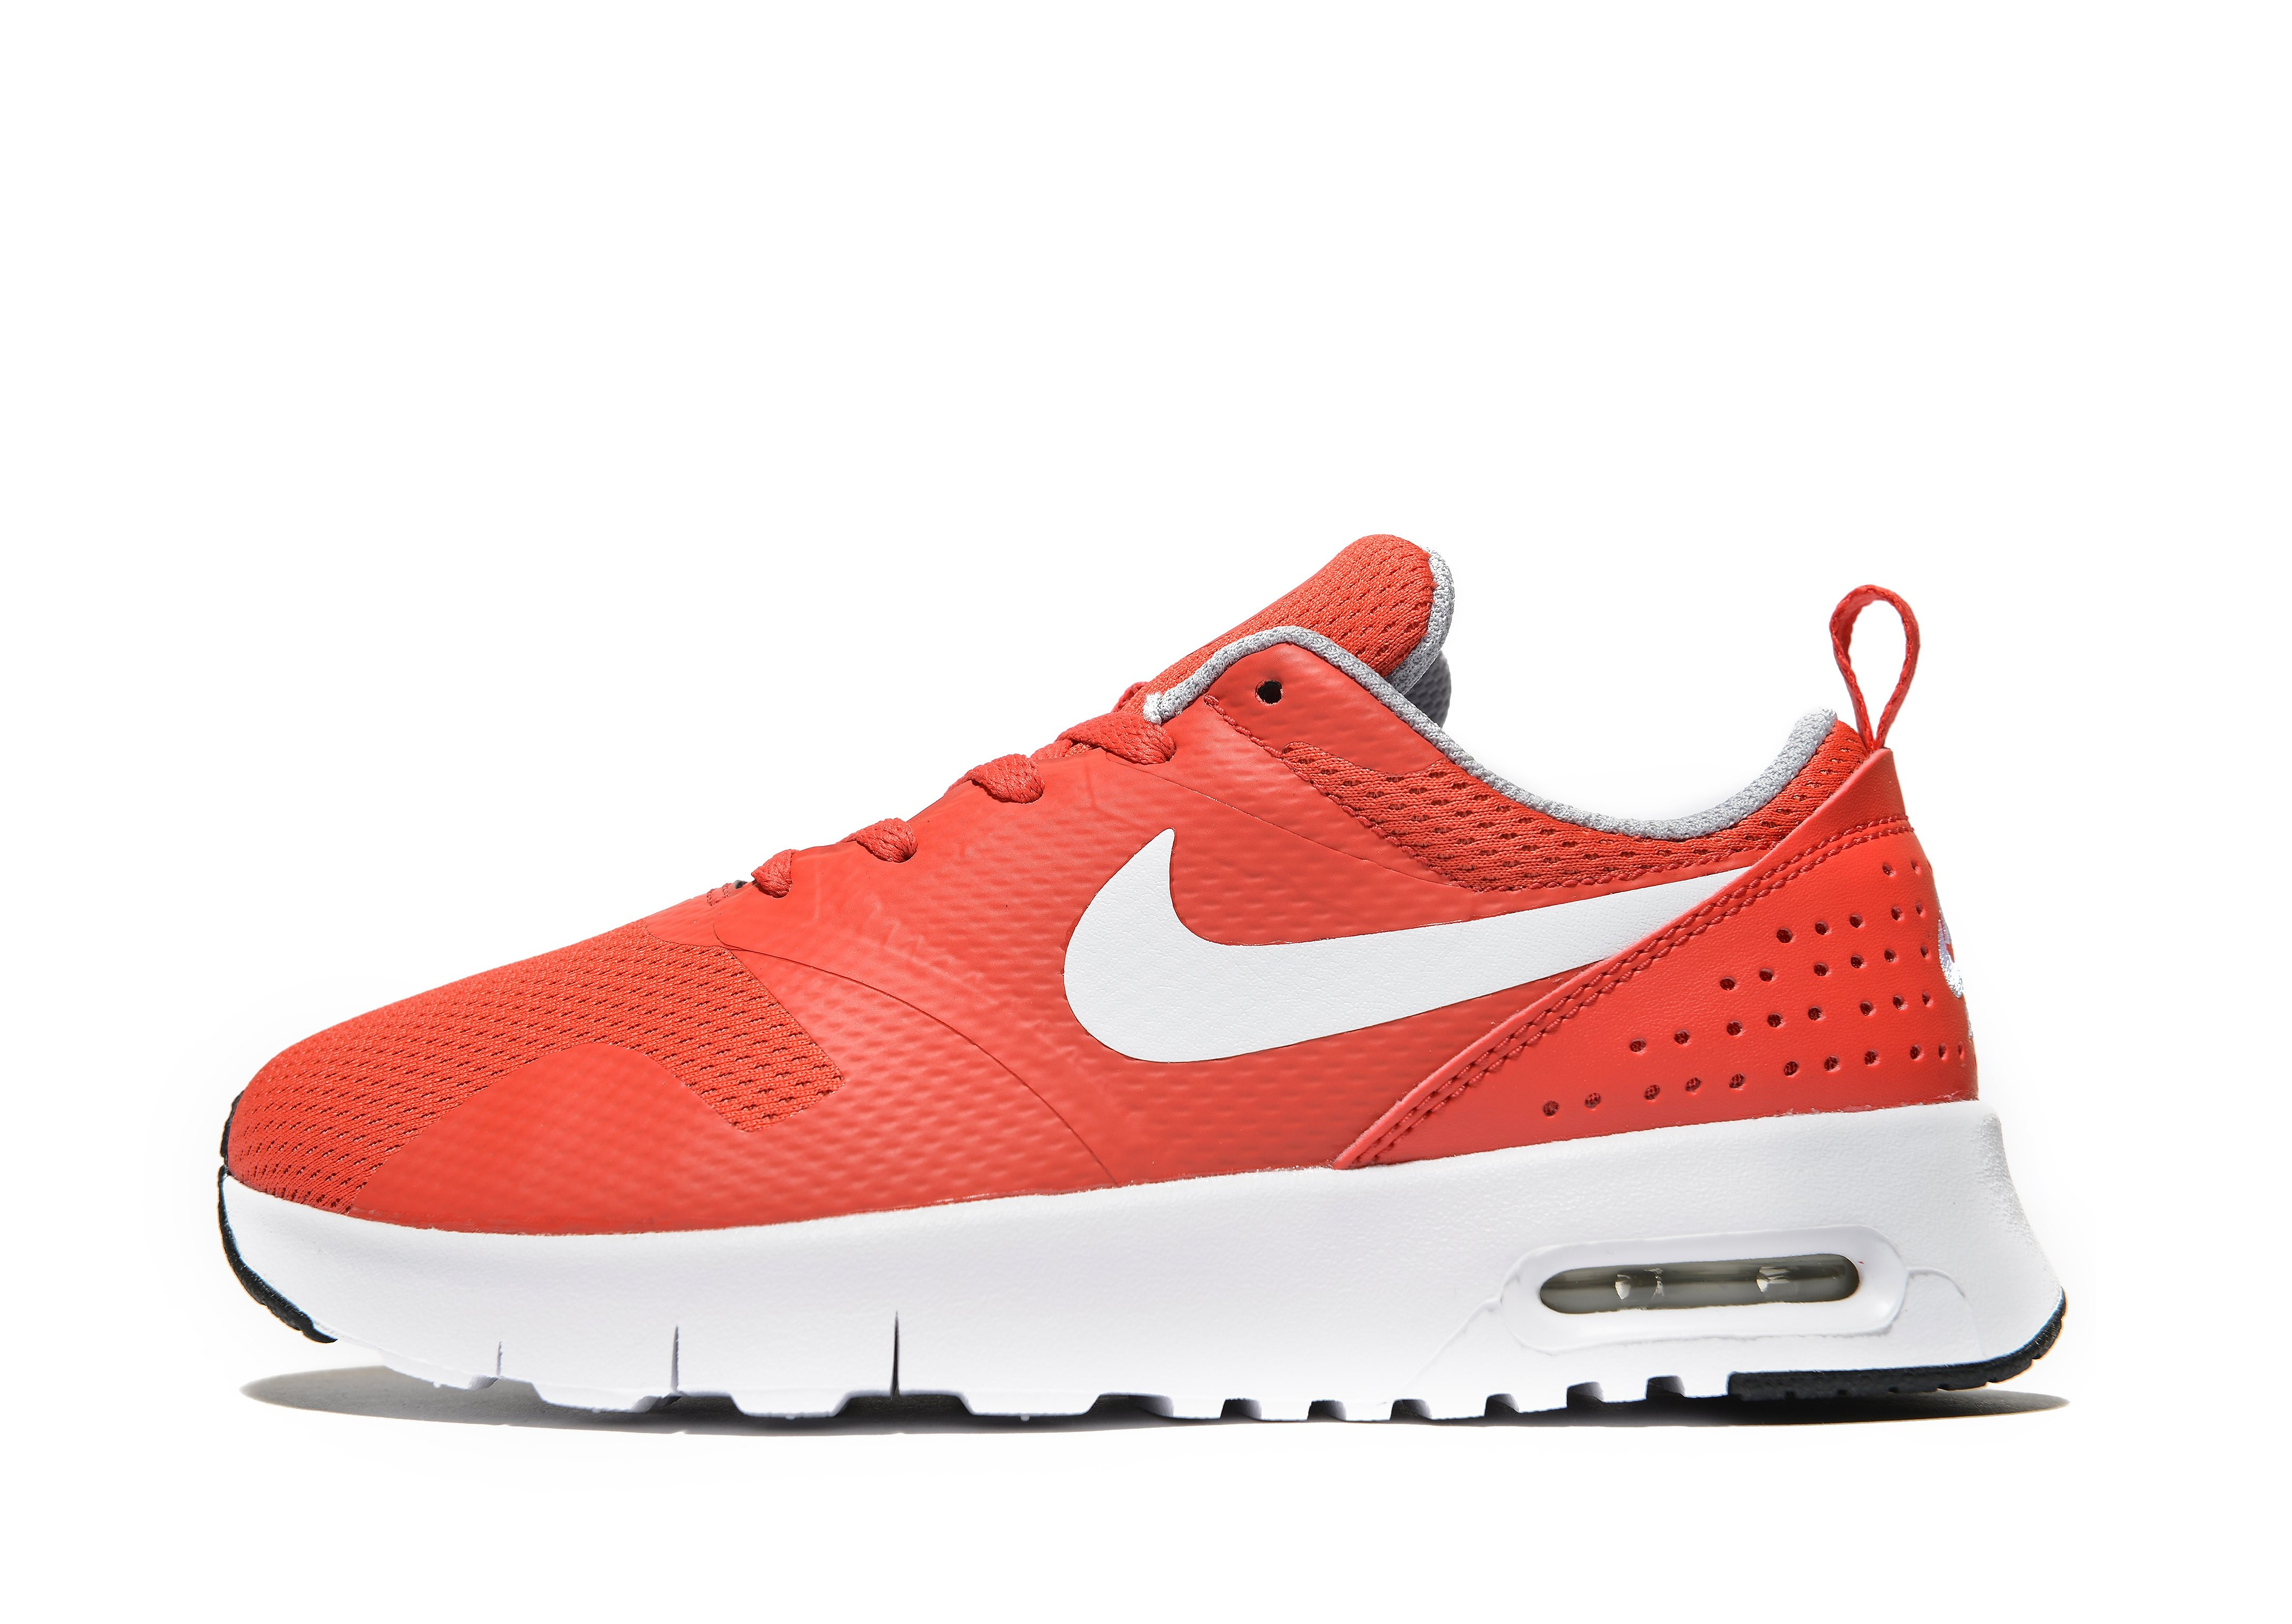 Nike Air Max Tavas Bambino